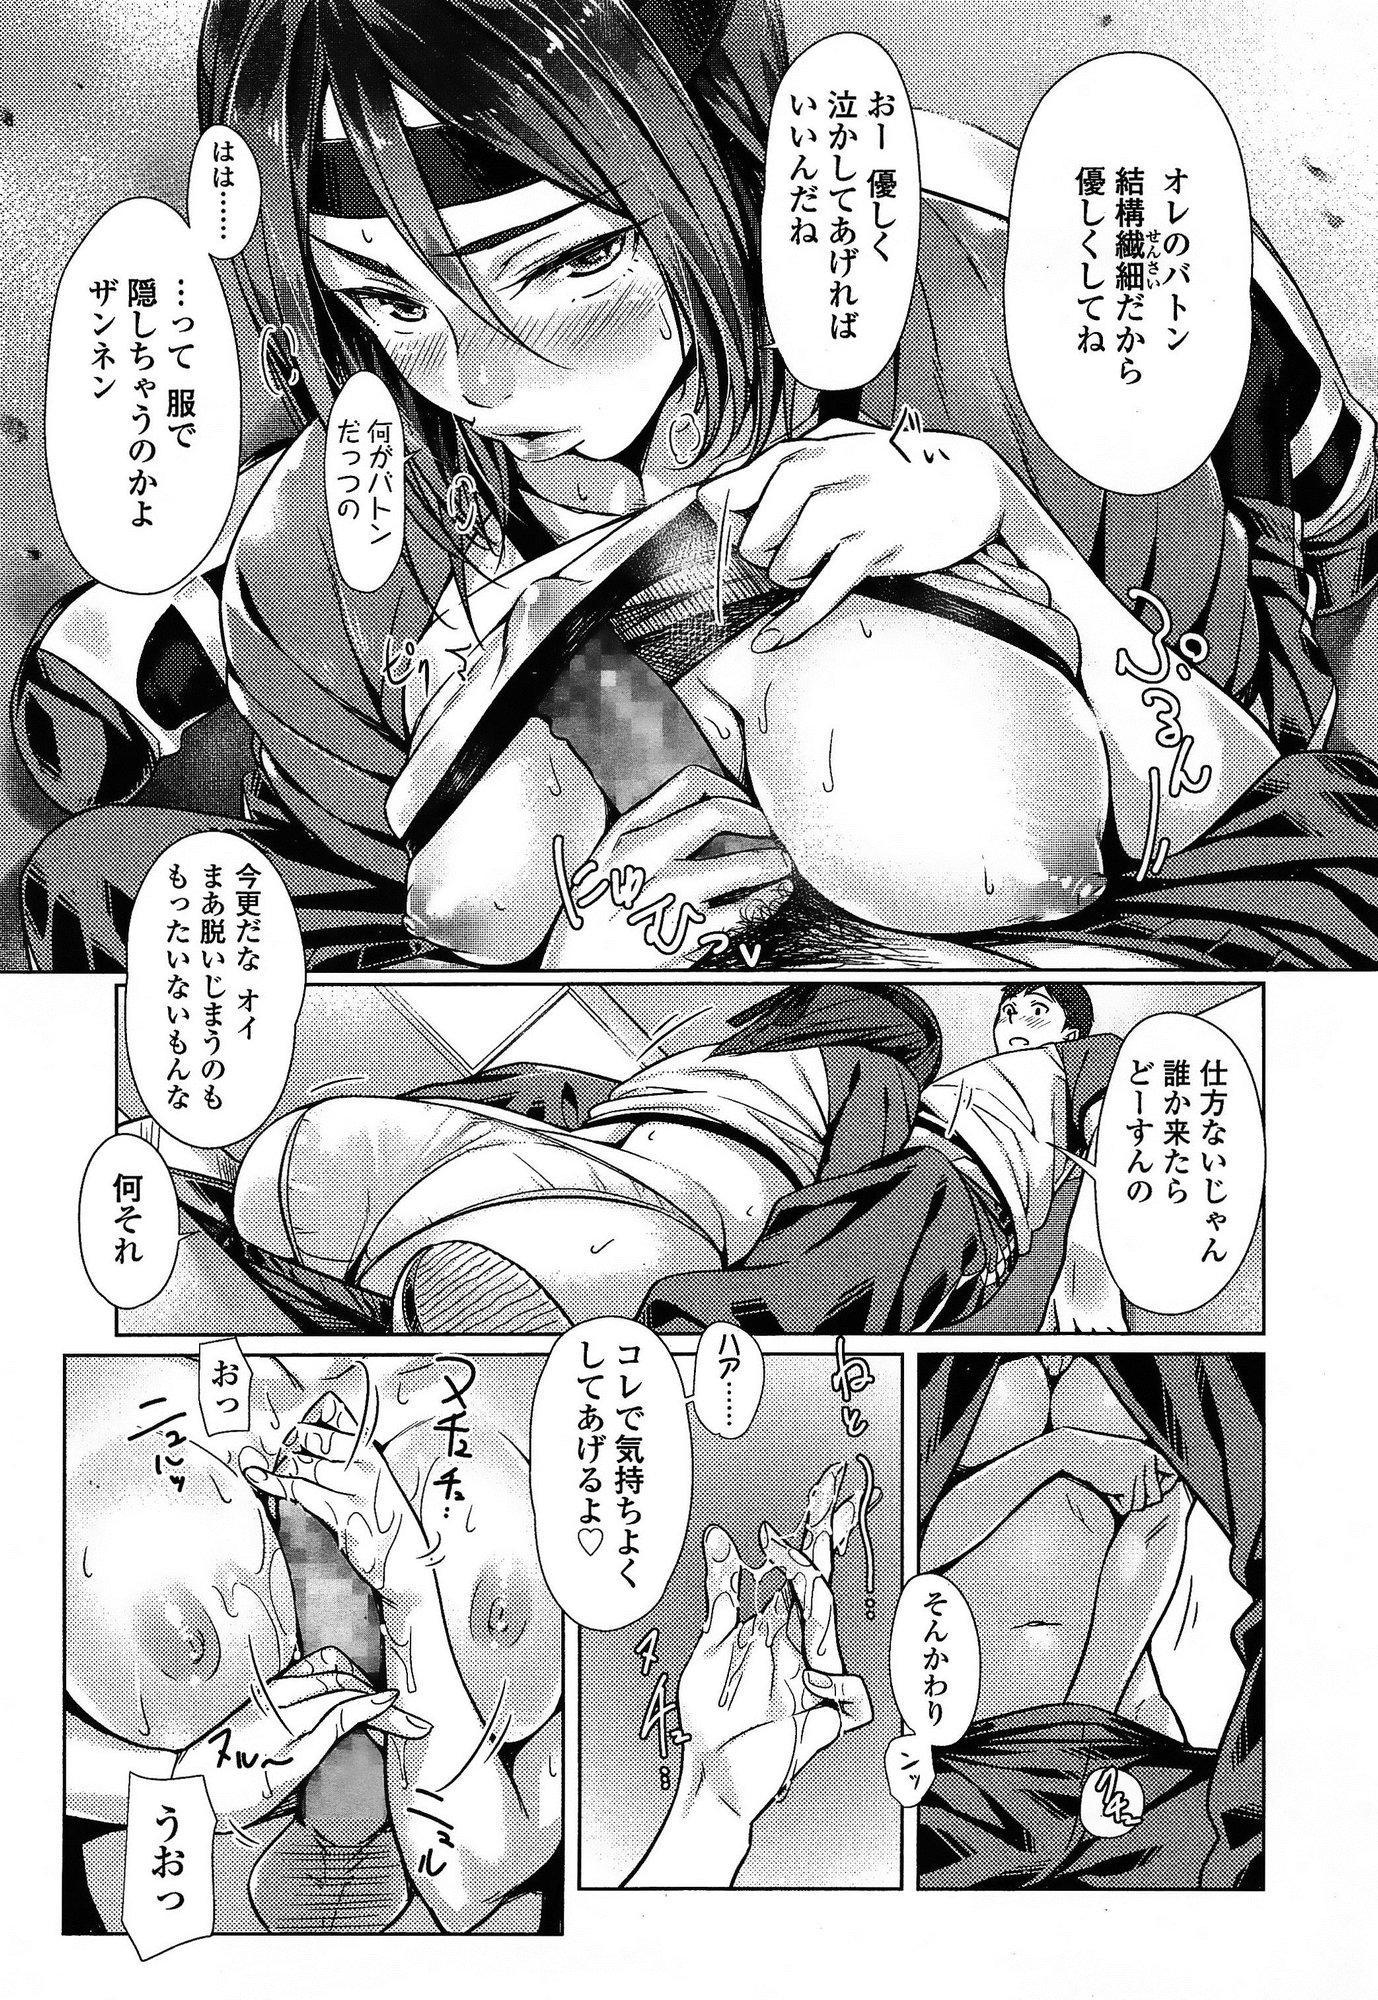 Comic Koh Vol.3 52